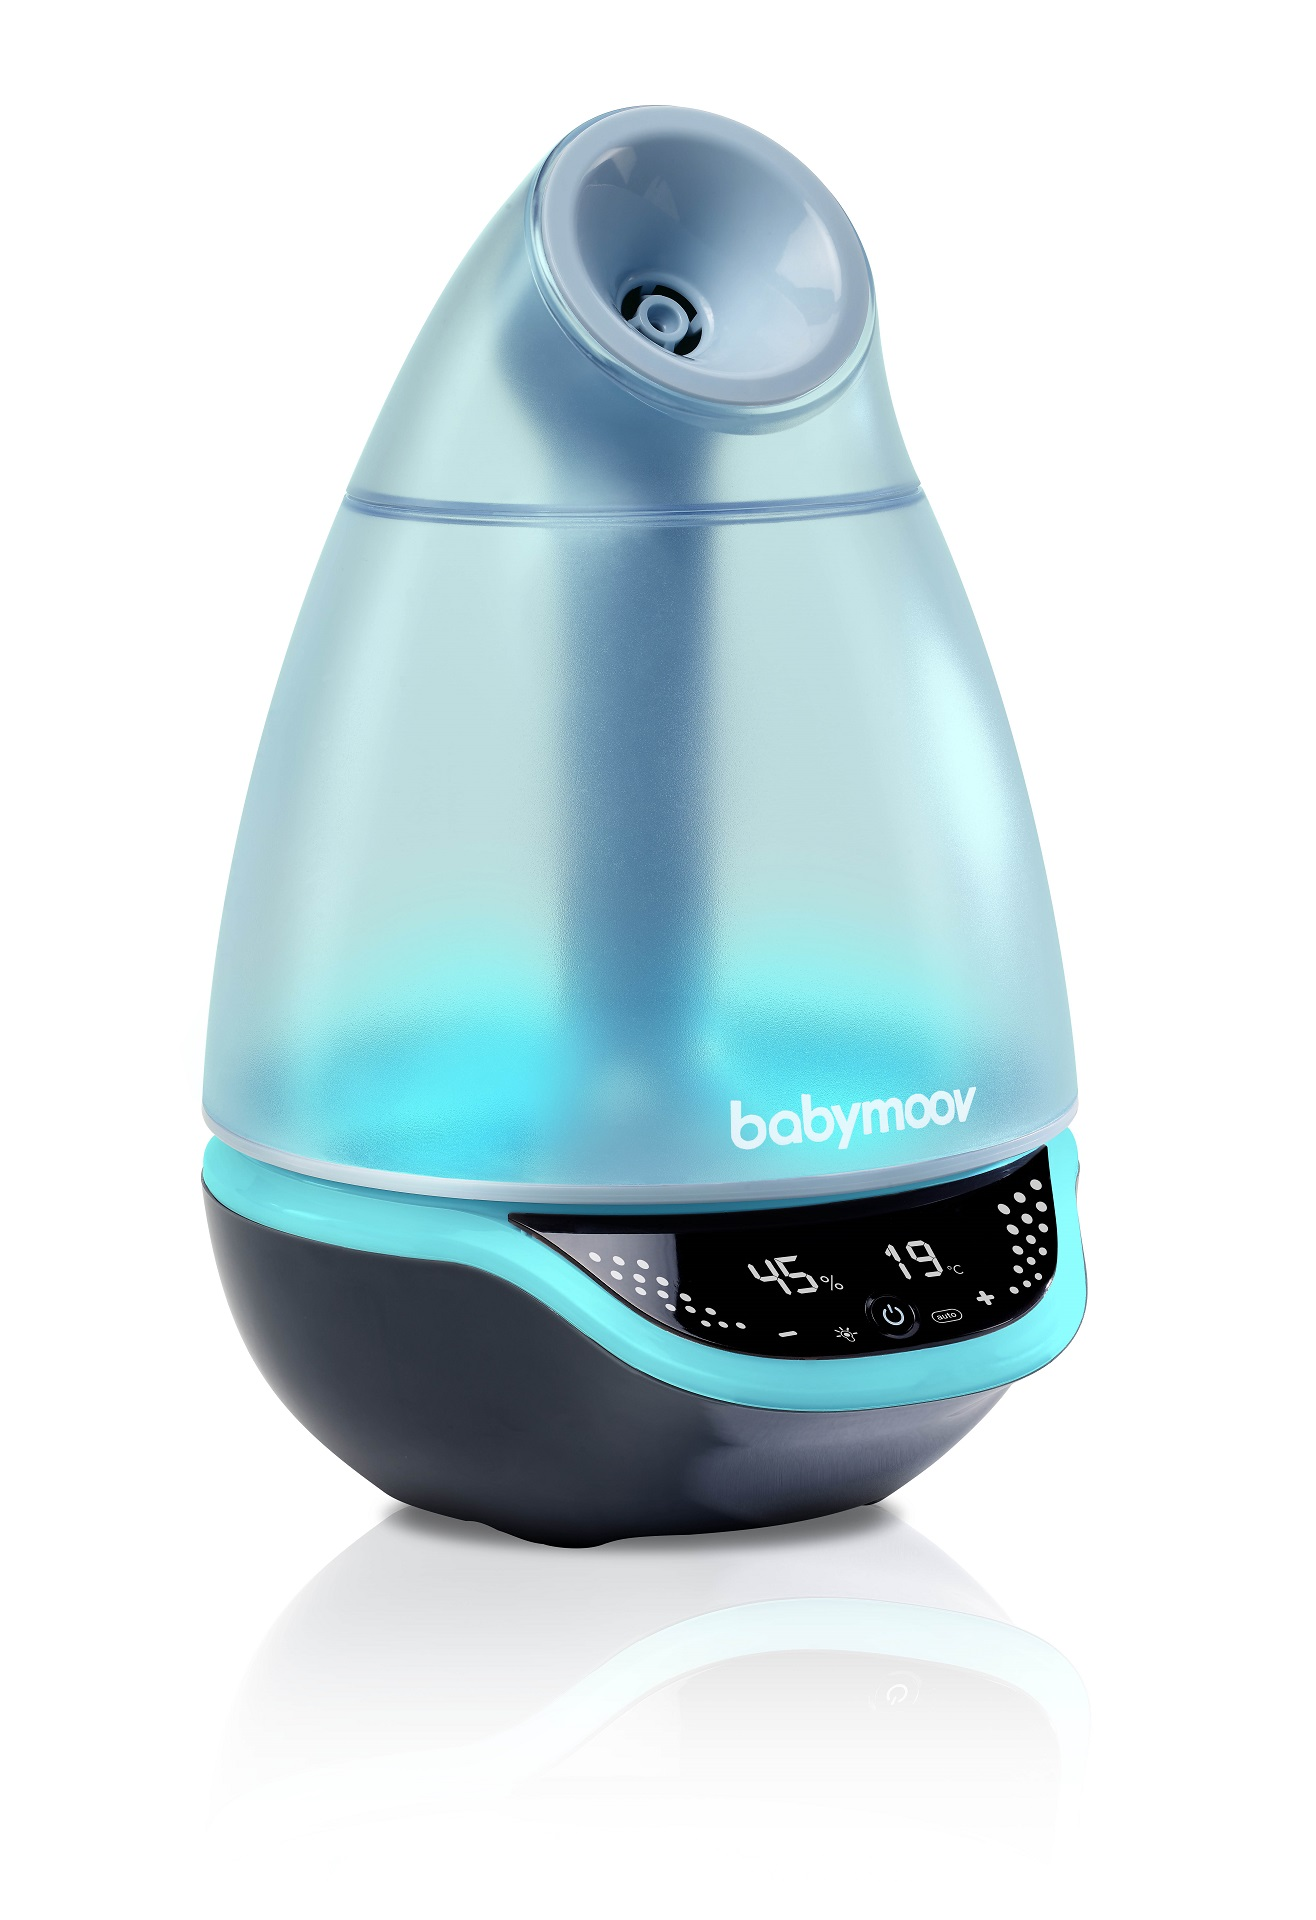 Babymoov Hygro Baby Humidifier Buy At Kidsroom Living